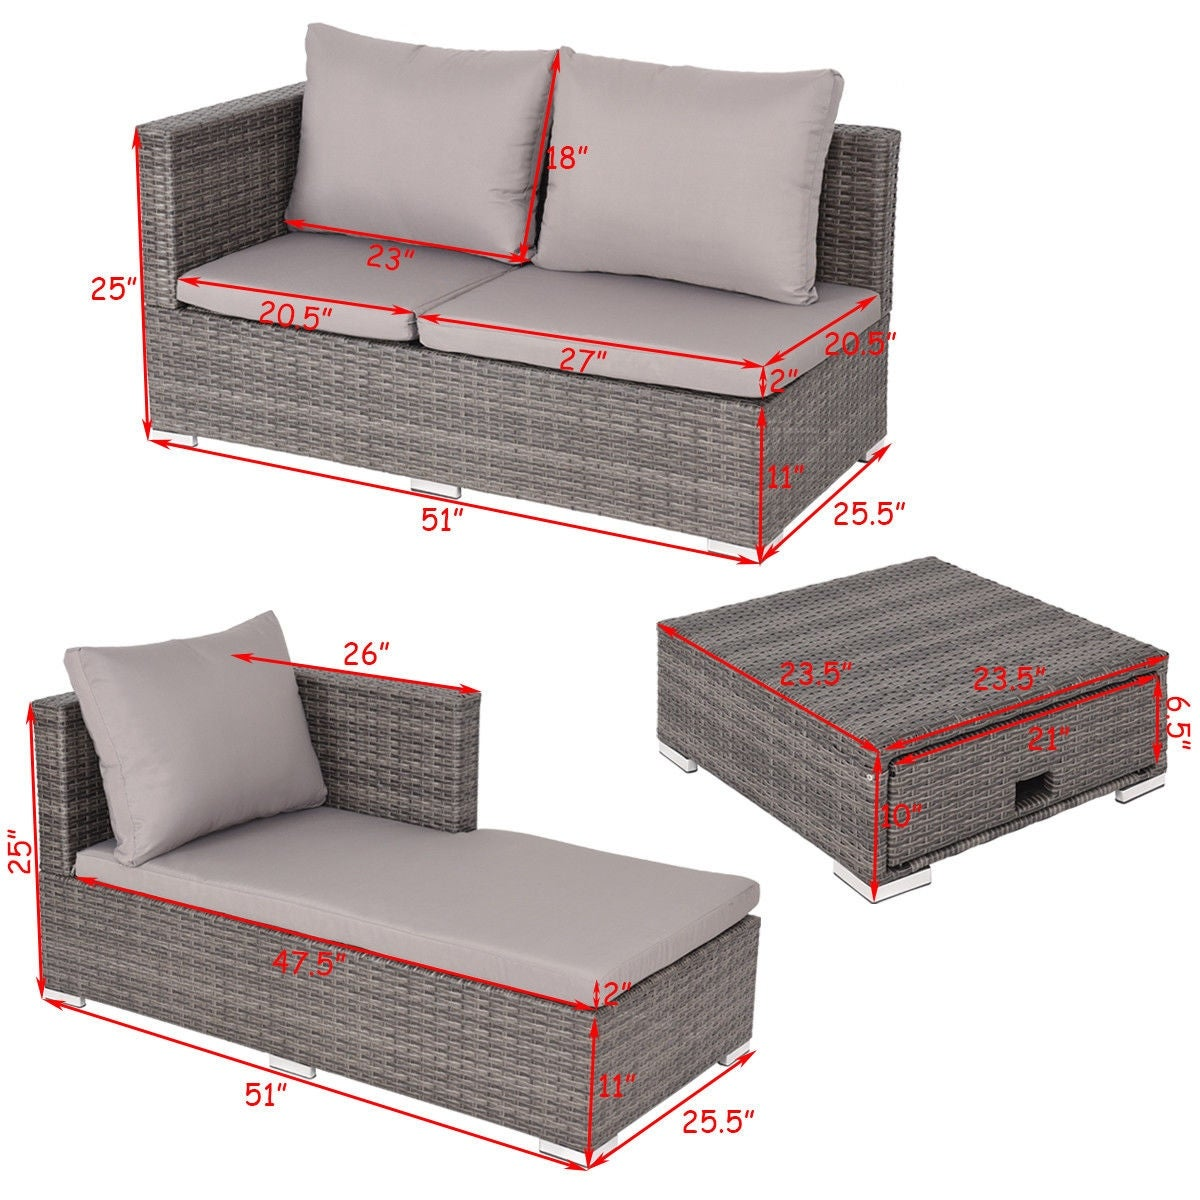 Shop Costway 3PCS Rattan Wicker Sofa Furniture Set Steel Frame Adjustable  Seat Patio Garden   Gray   Free Shipping Today   Overstock.com   22363639